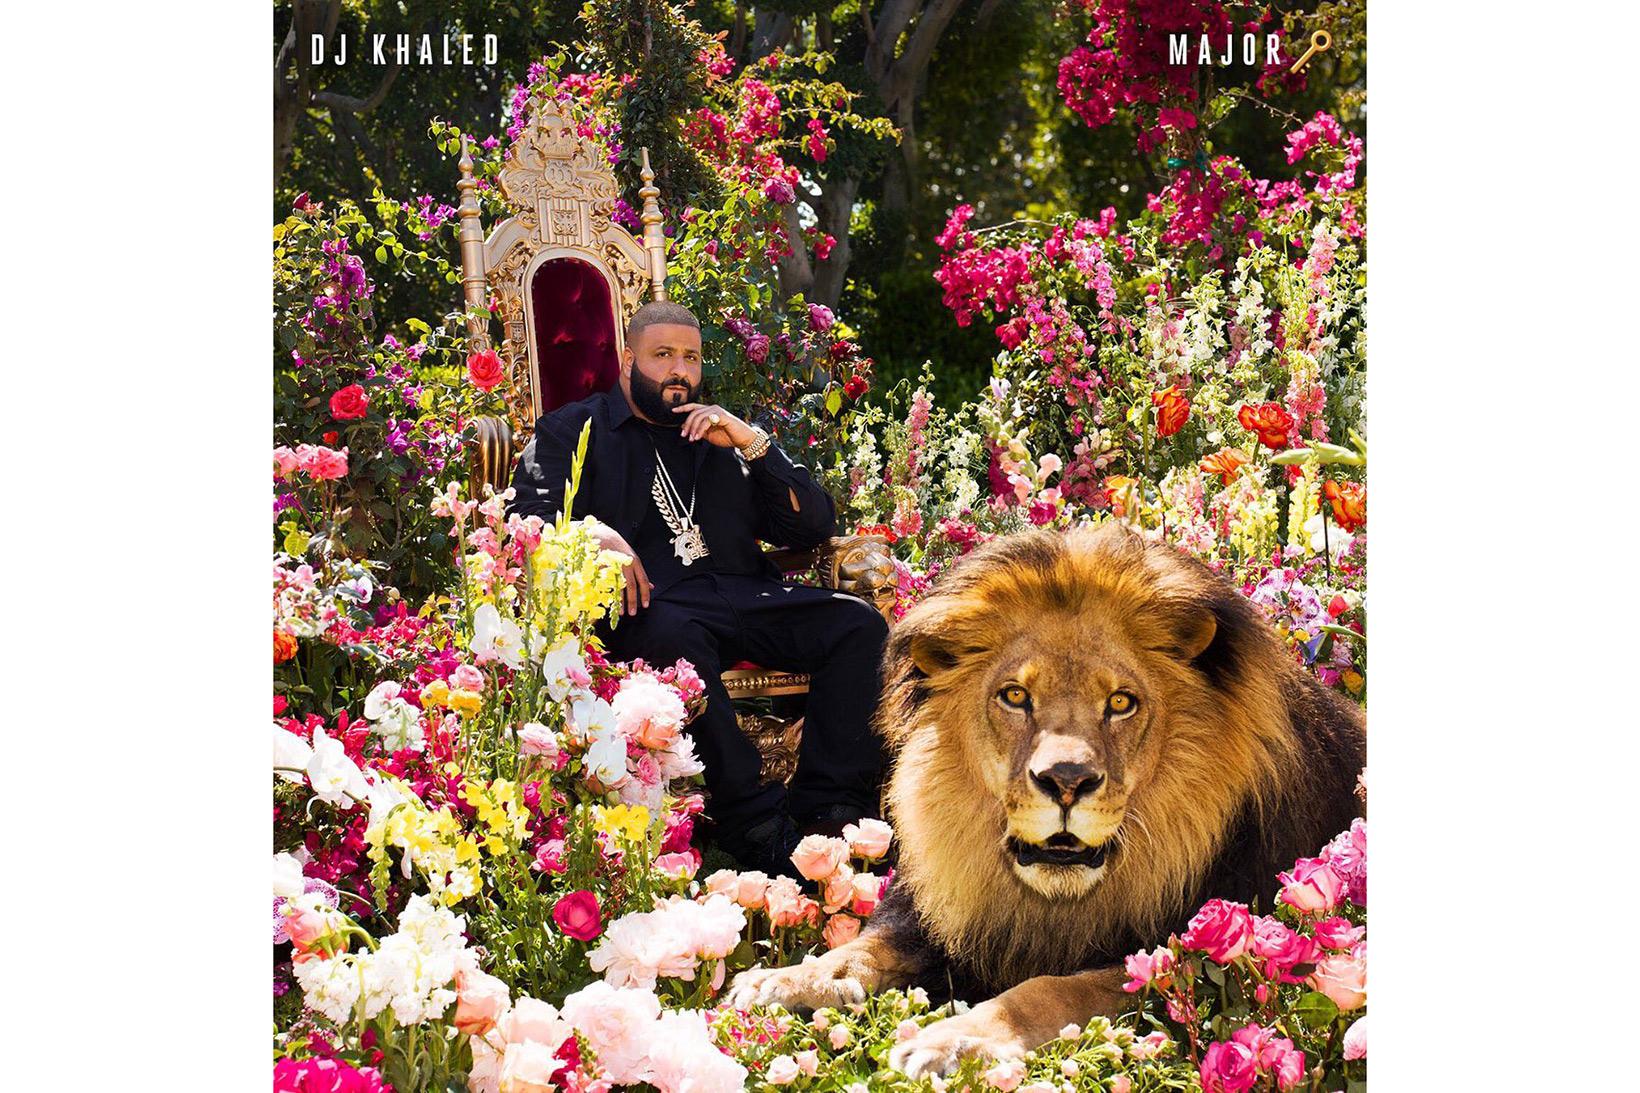 Stream DJ Khaled's Highly Anticipated 'Major Key' Album Now